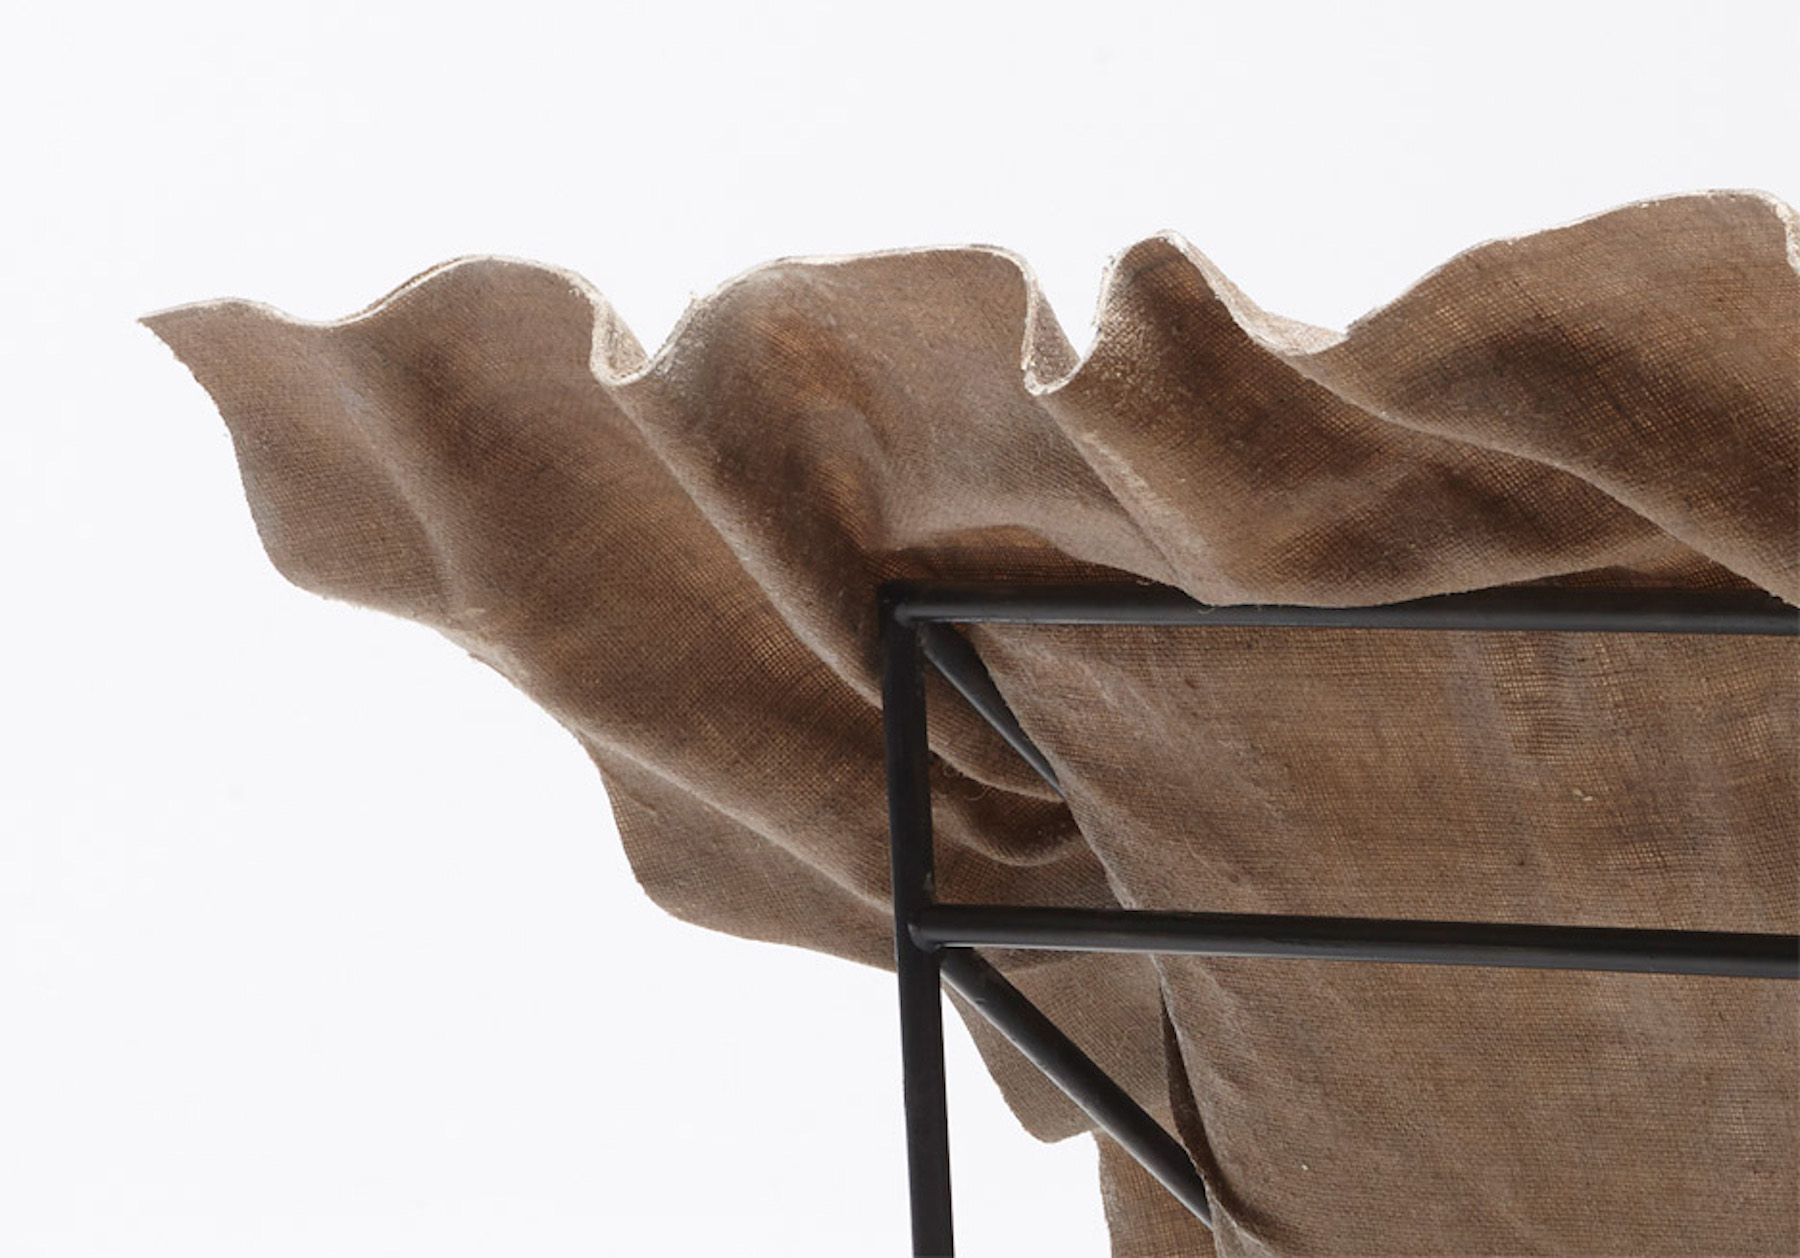 iGNANT-Design-Demeter-Fogarasi-Poetic-Furniture-Frozen-Textiles-04